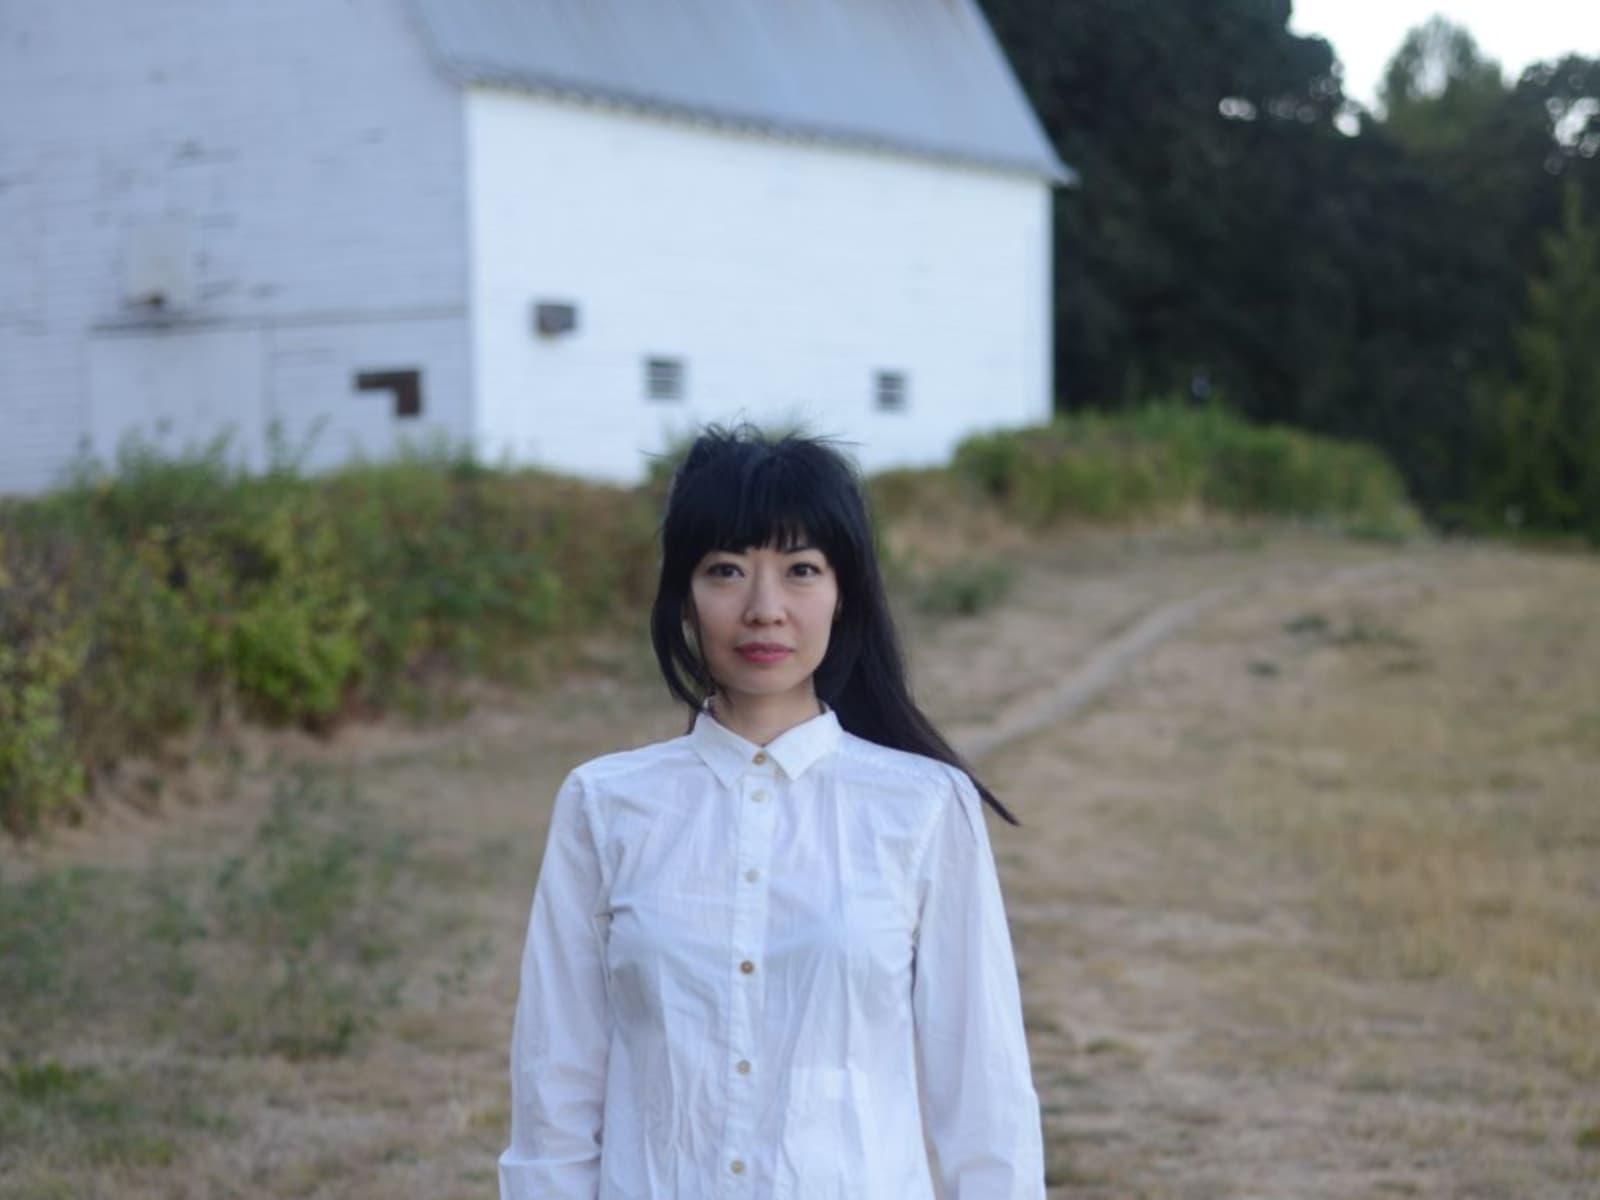 Mila from Corvallis, Oregon, United States